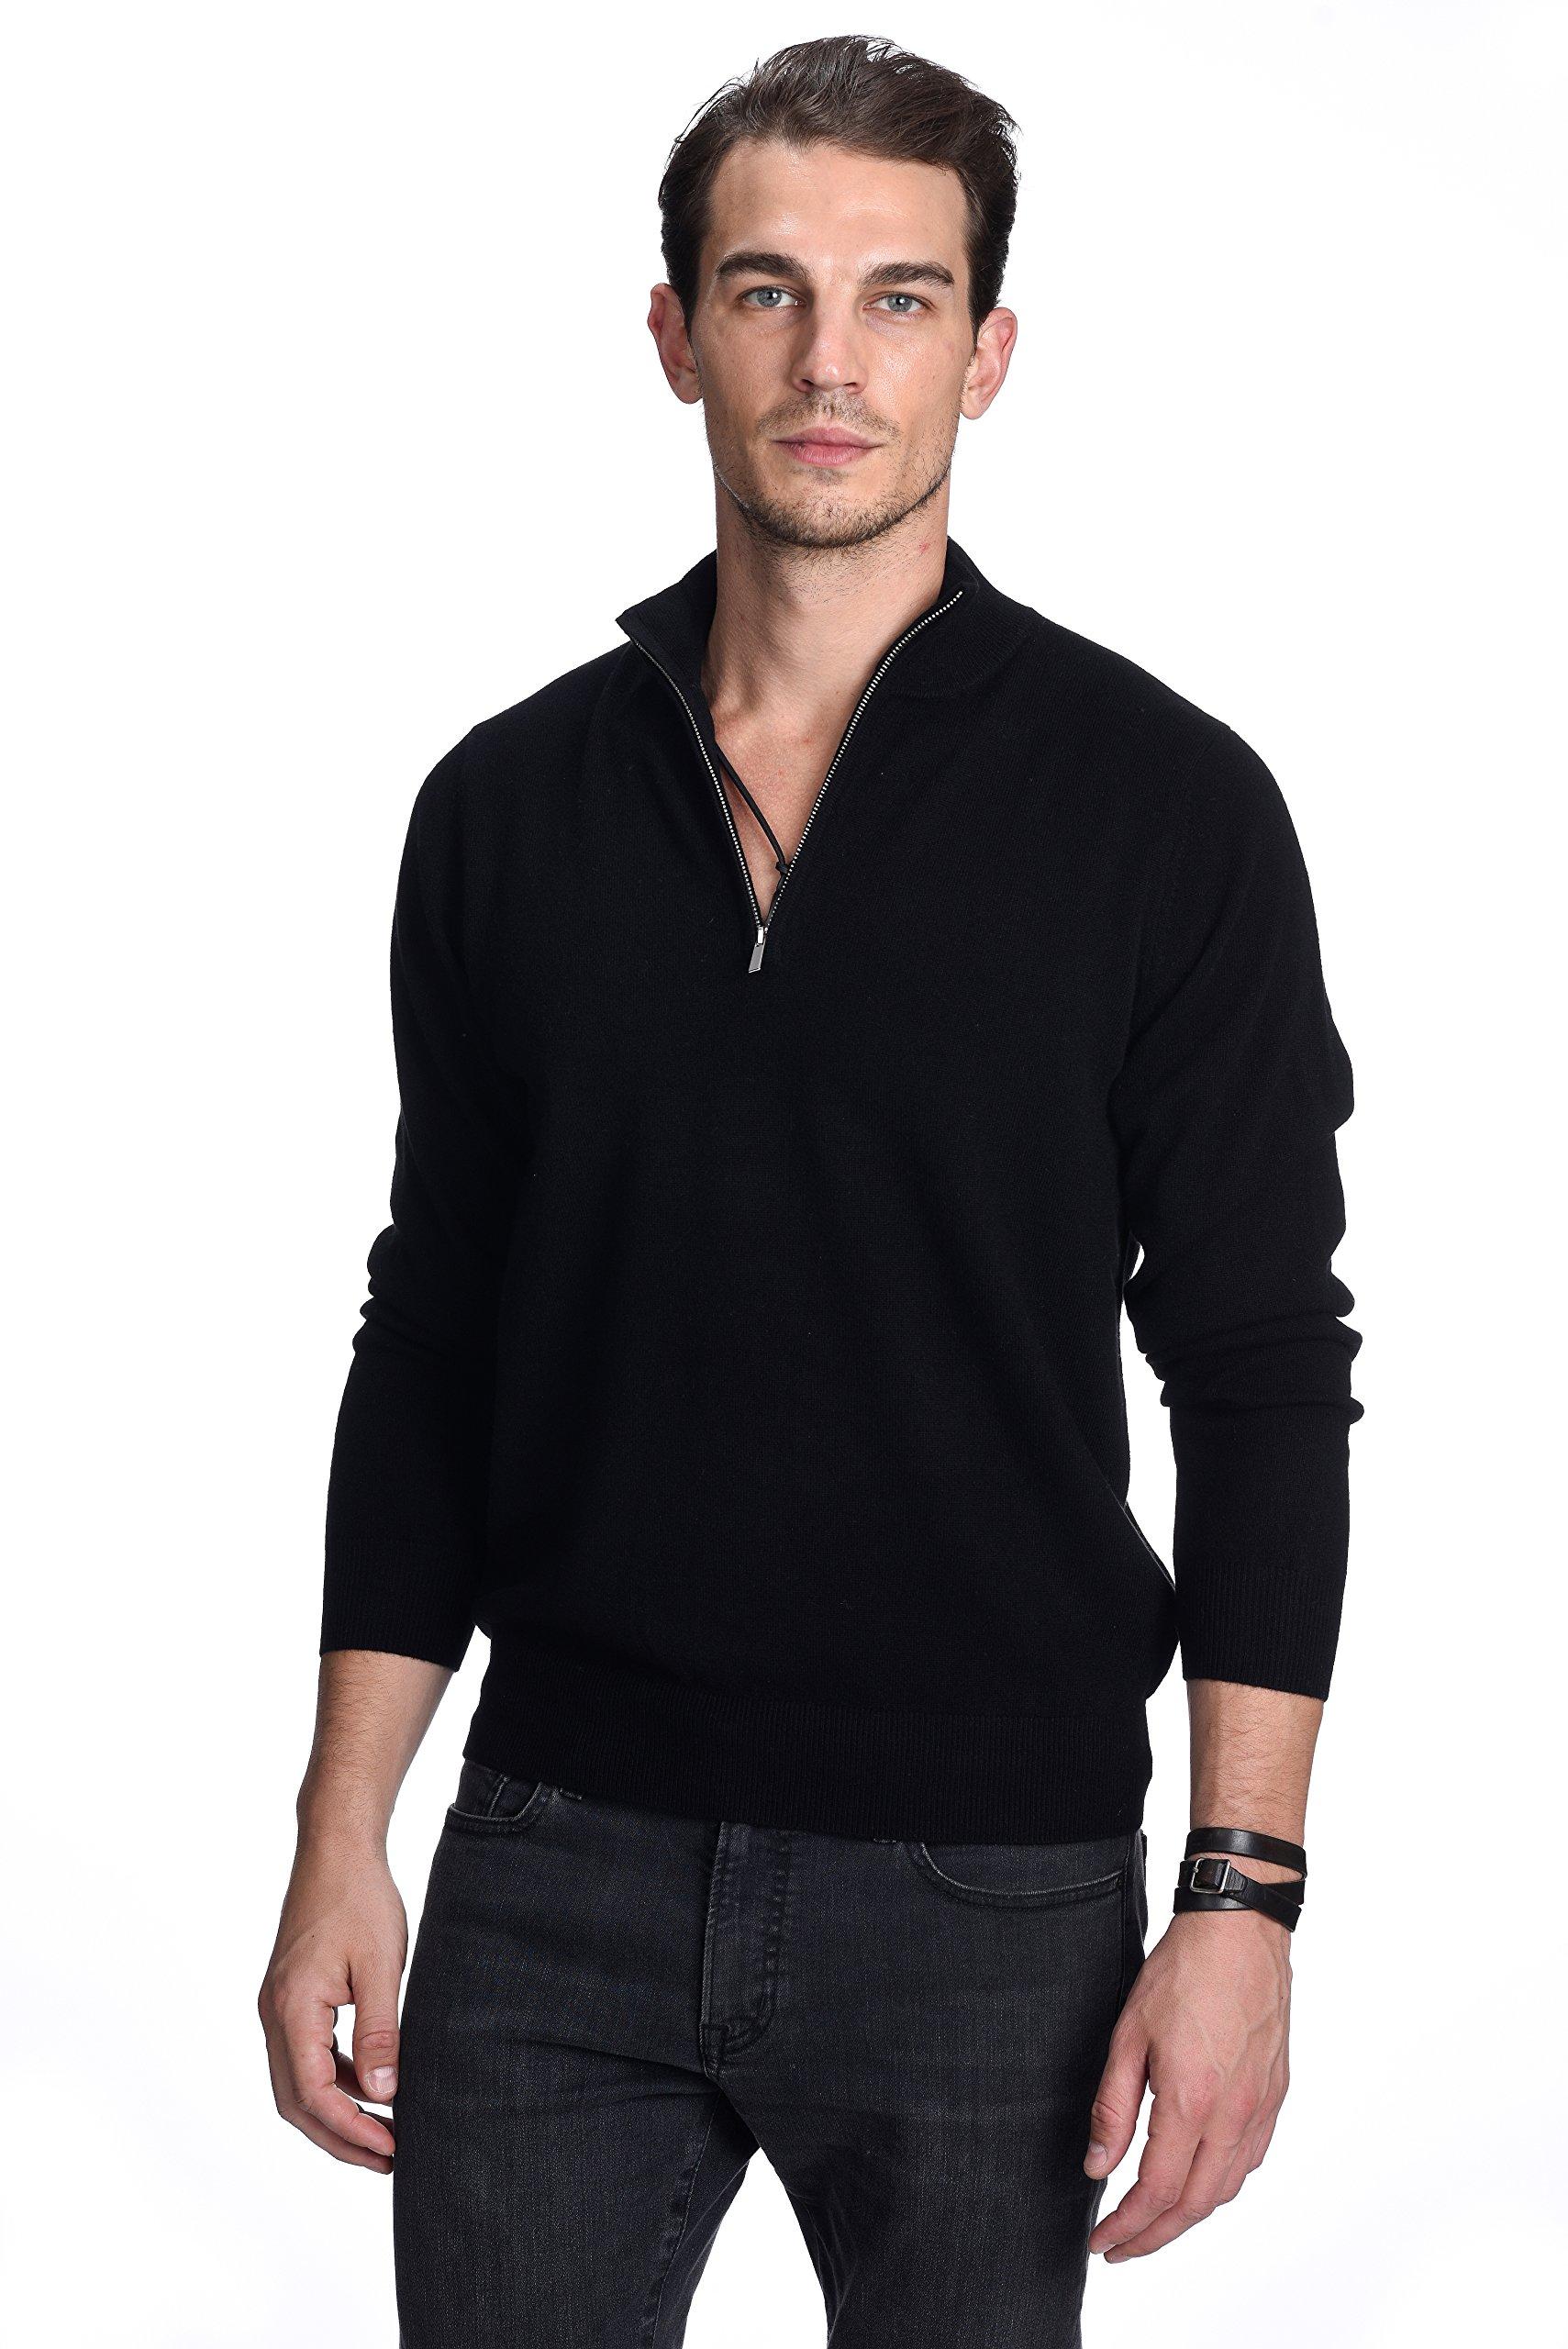 State Cashmere Men's 100% Pure Cashmere Pullover Half Zip Mock Neck Sweater (Large, Black)